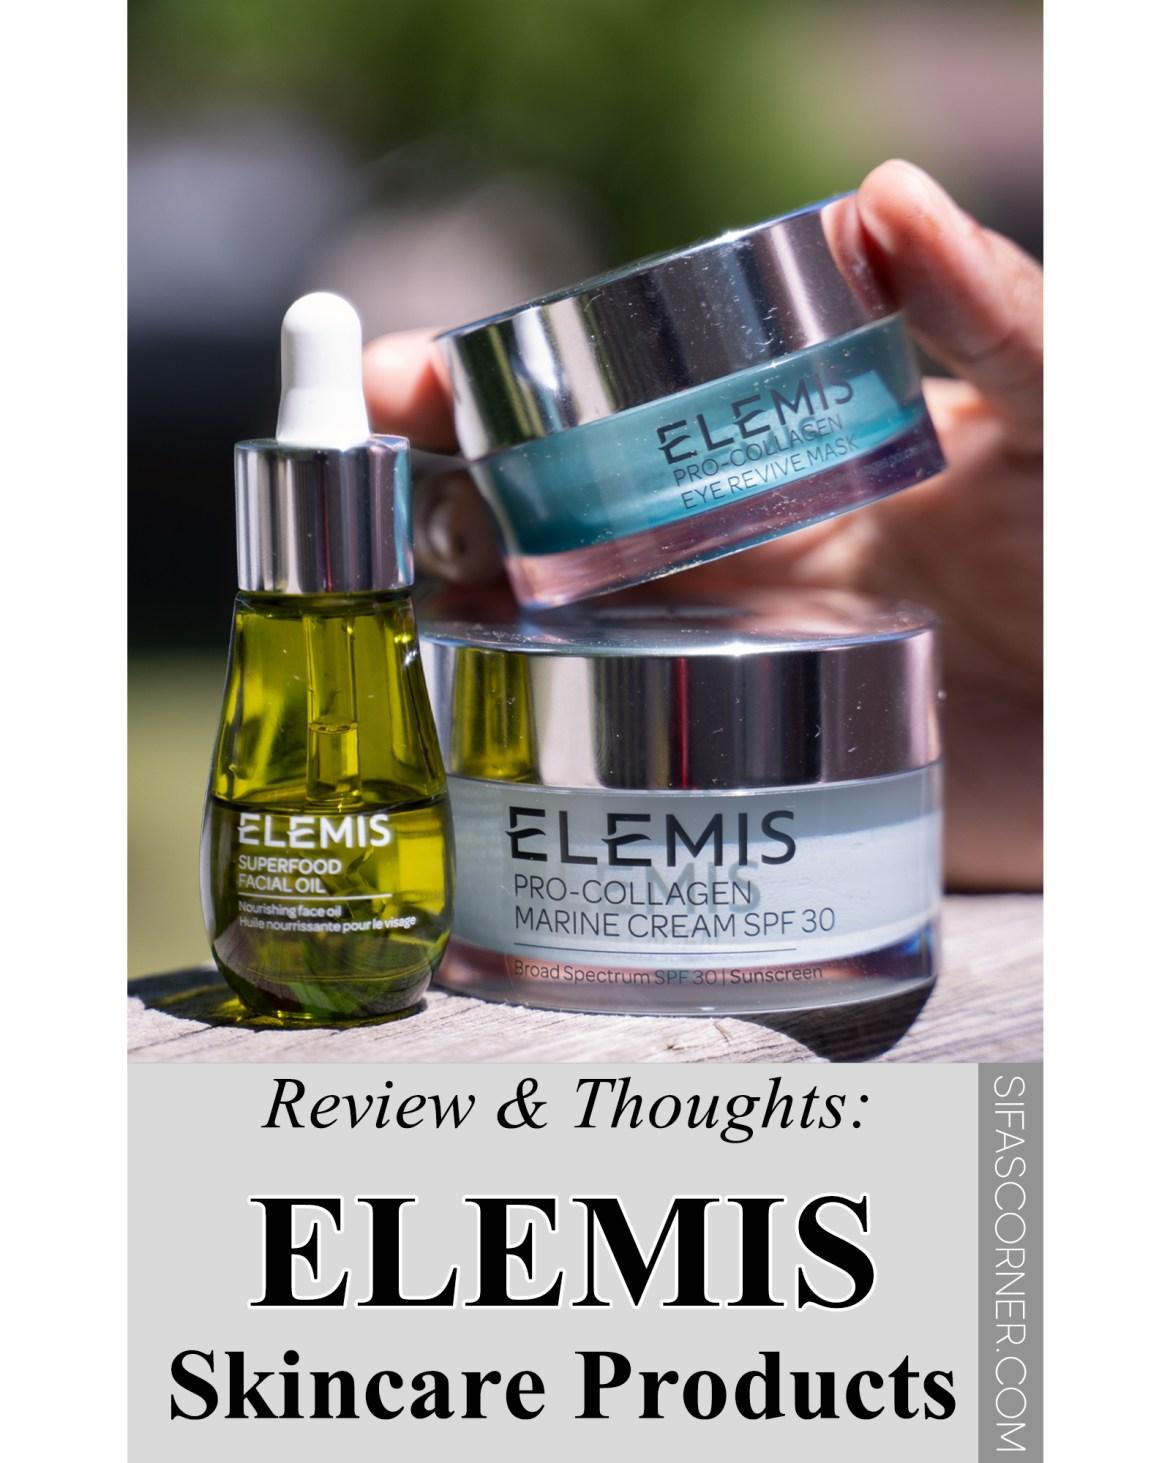 Luxury Skincare ELEMIS review